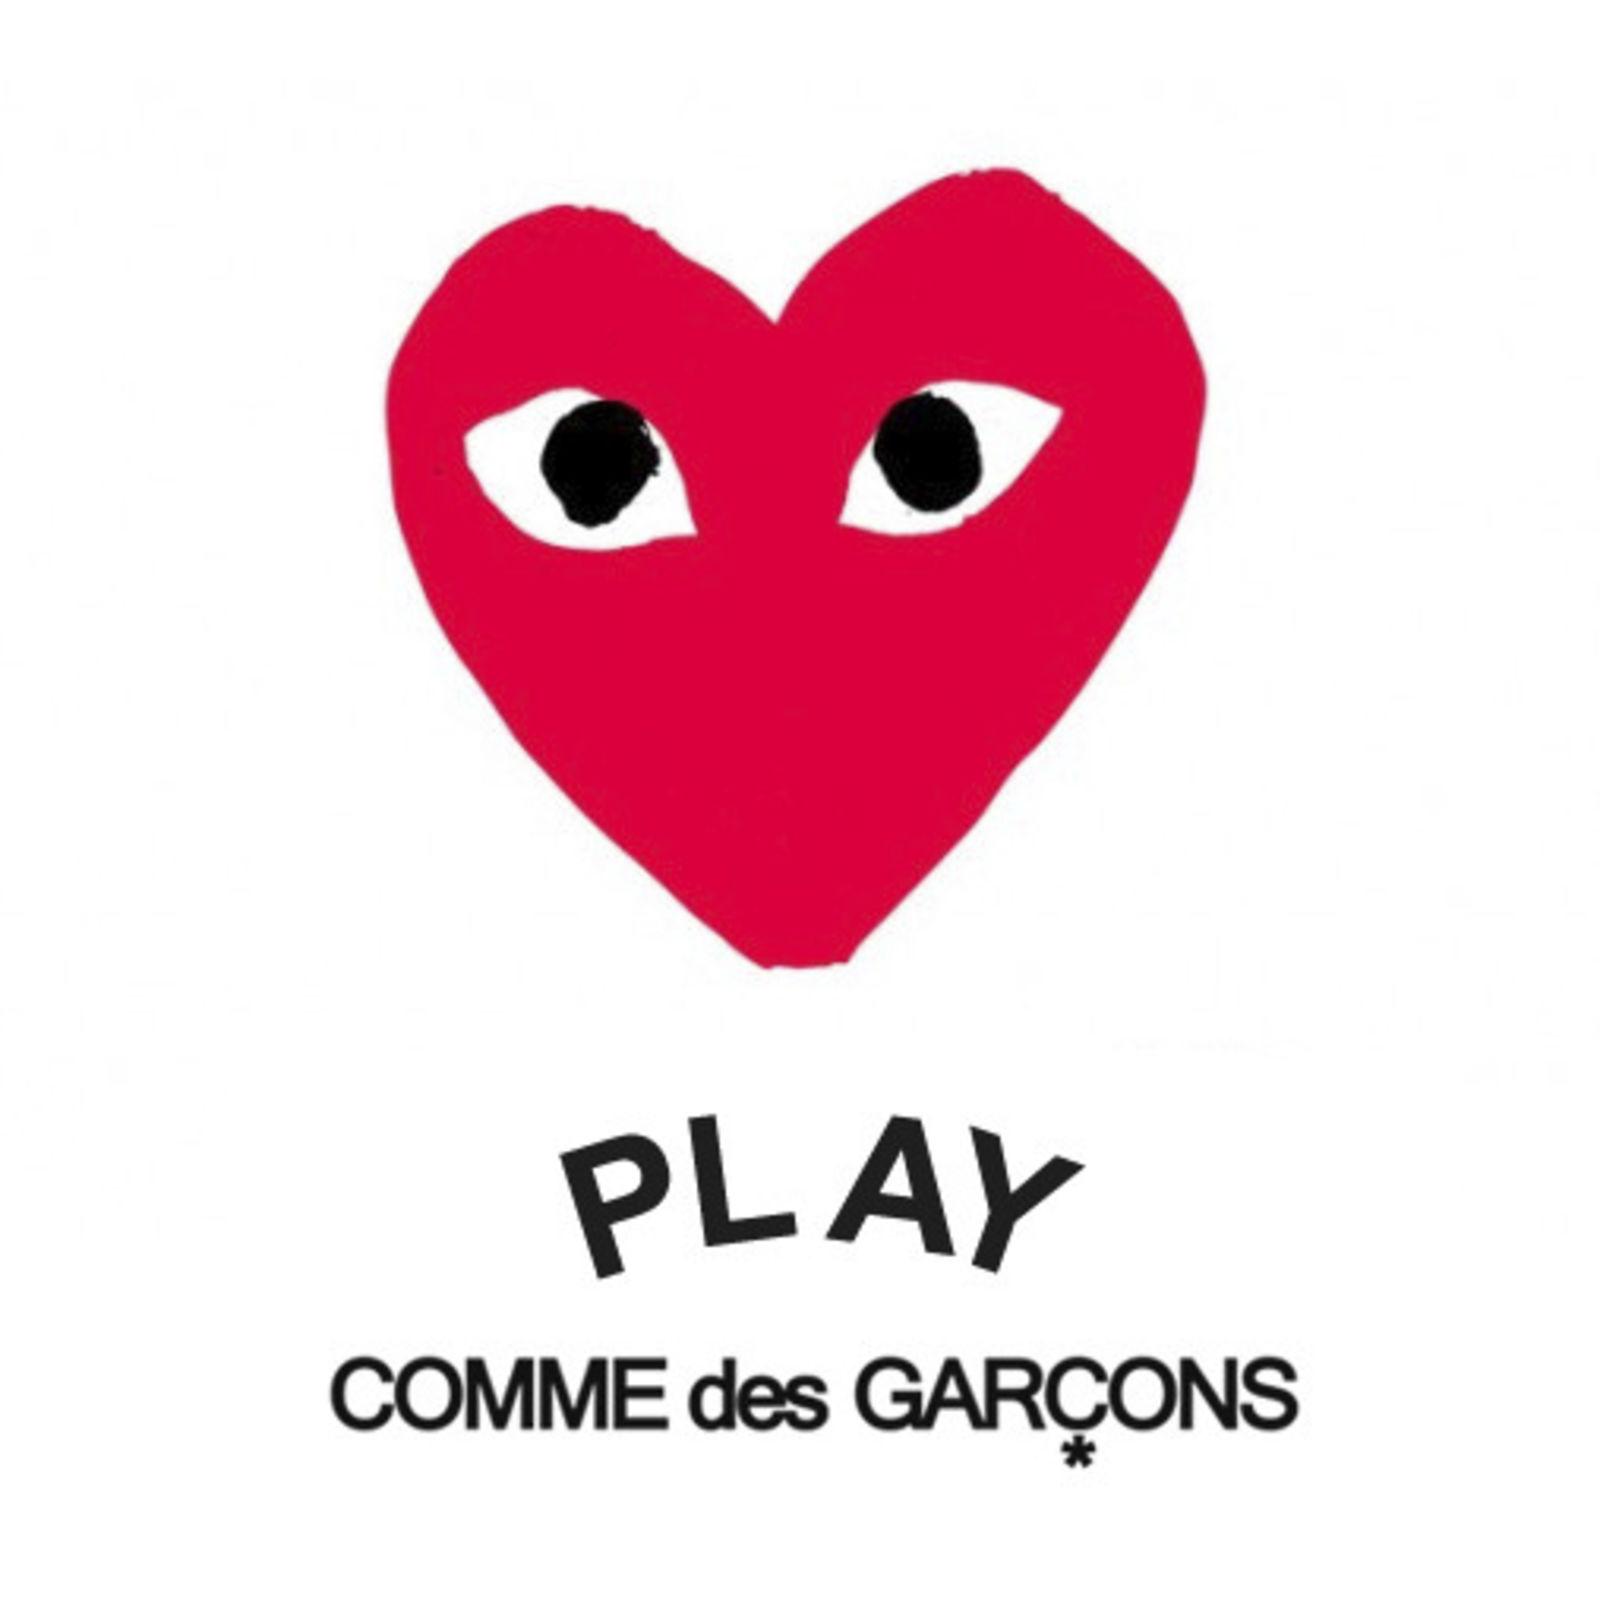 COMME DES GARÇONS PLAY (Bild 1)